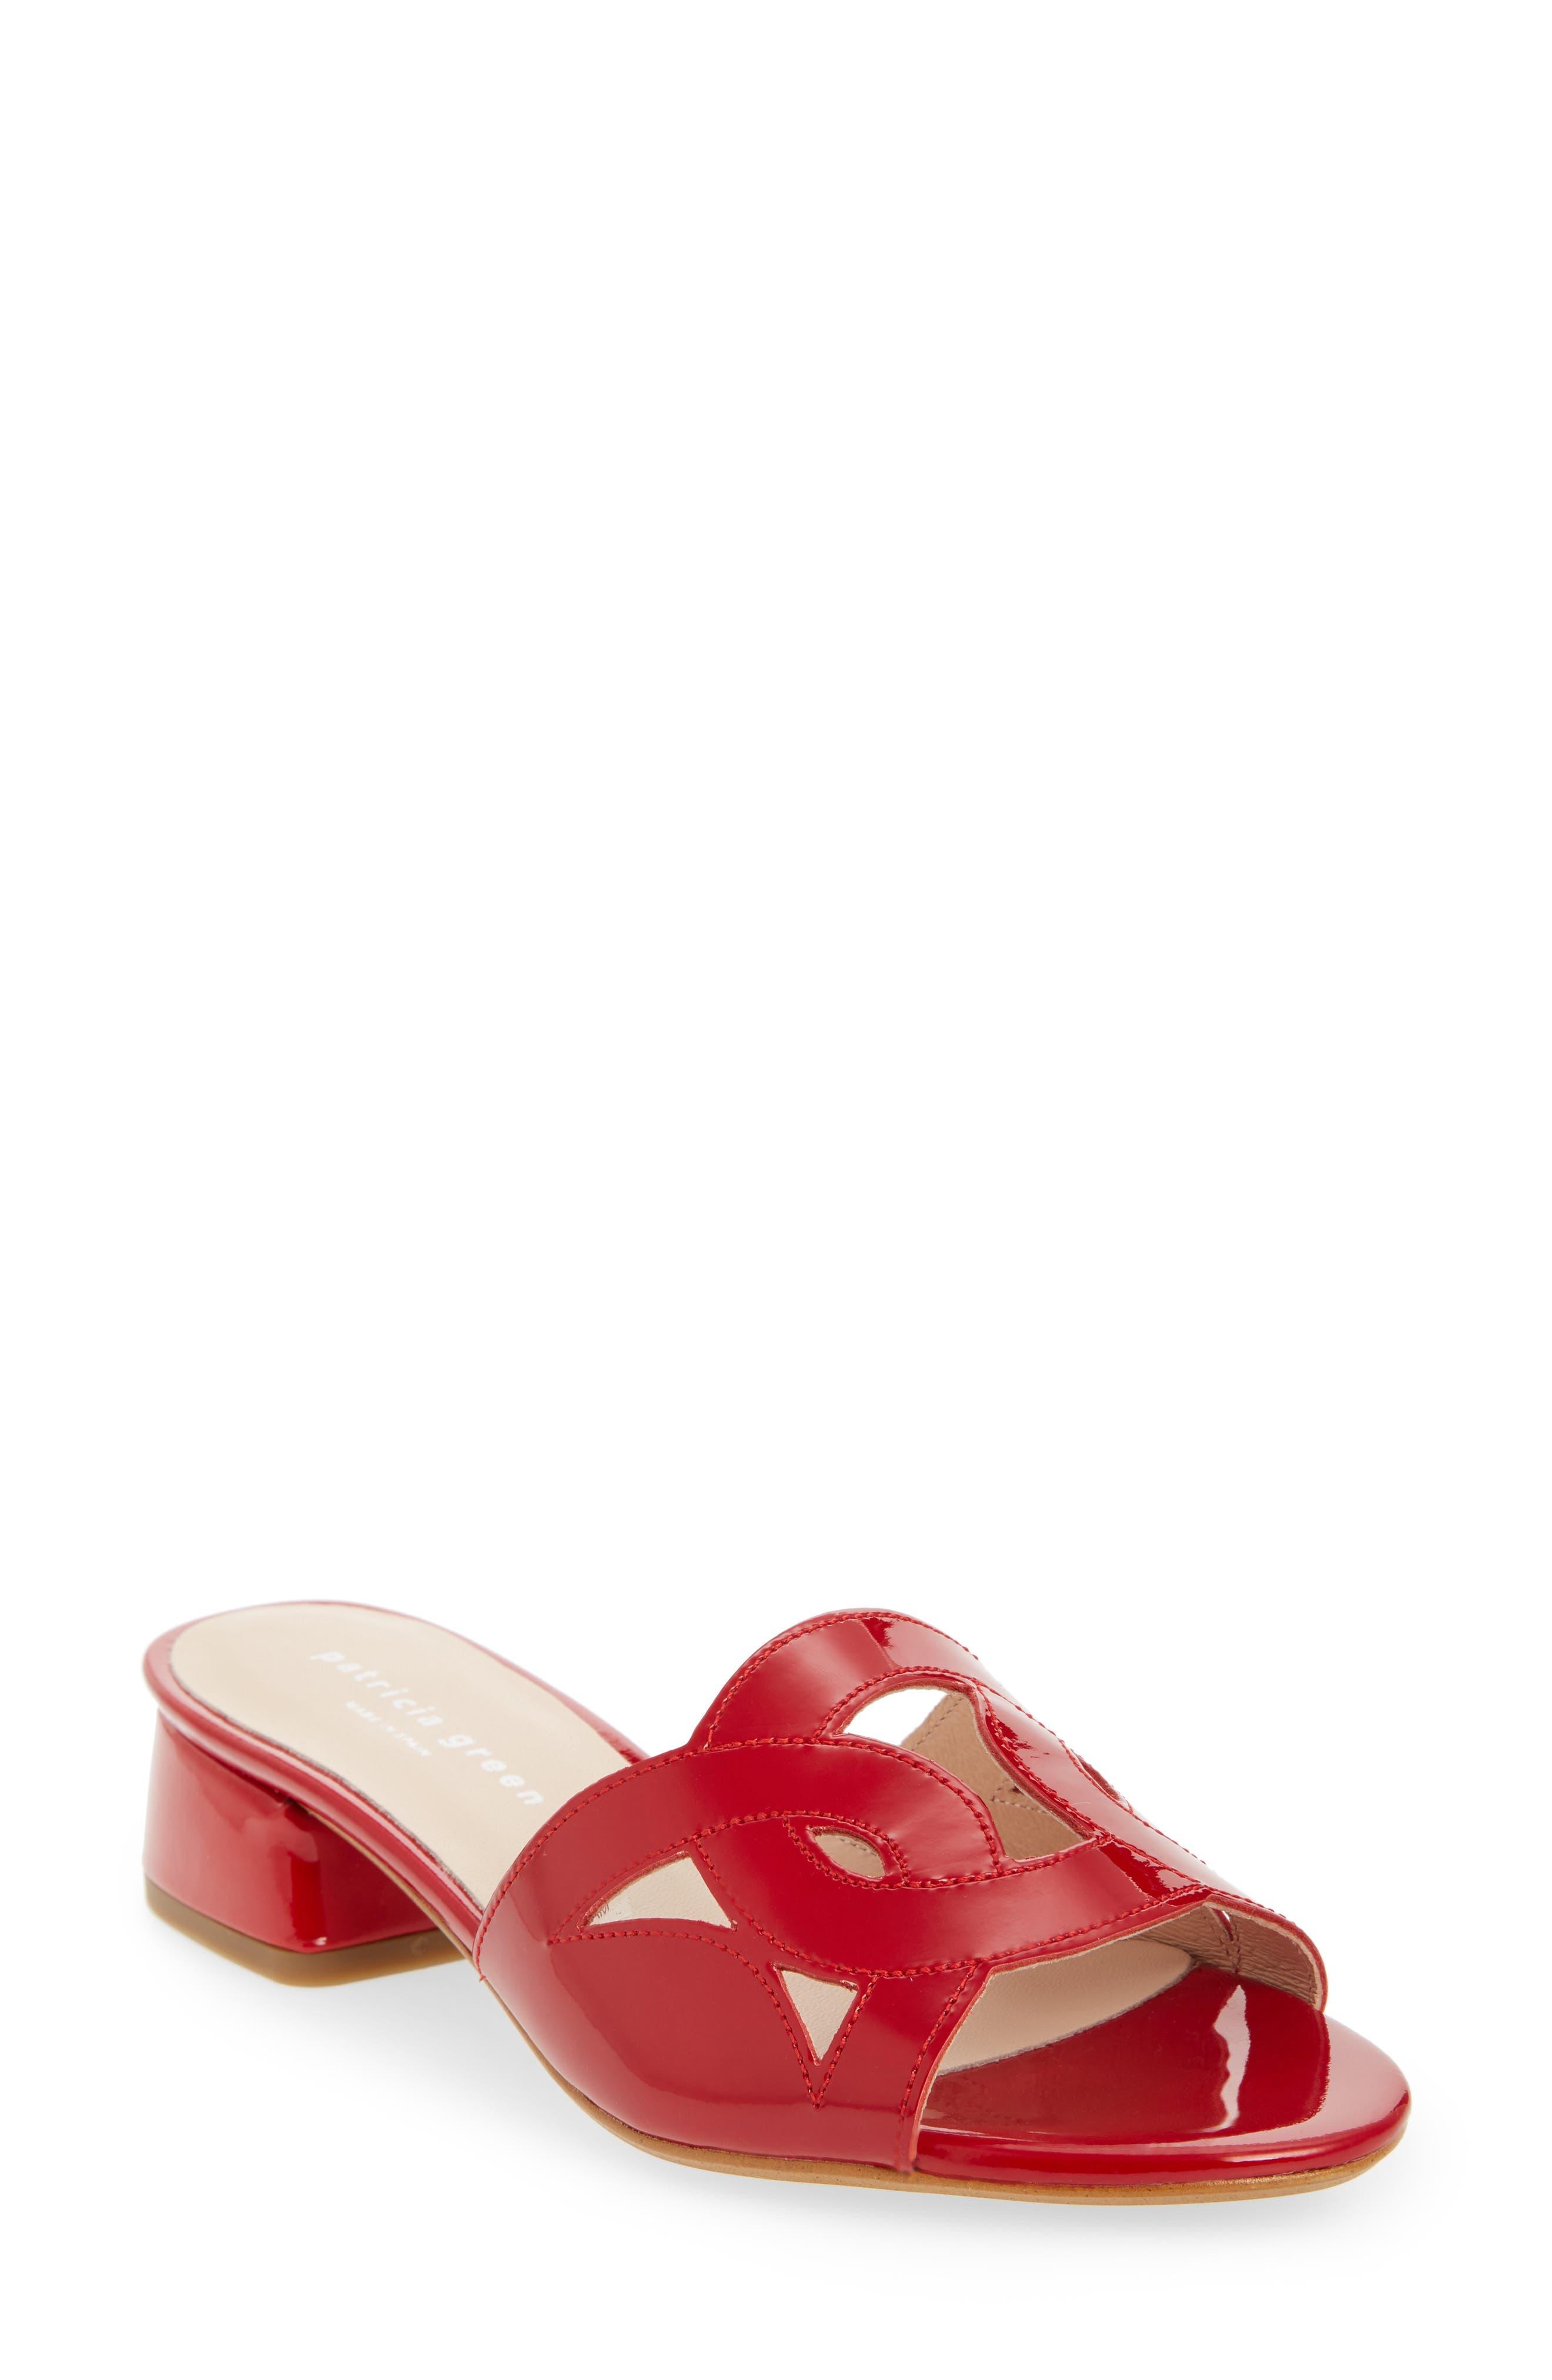 Patricia Green Boca Slide Sandal- Red